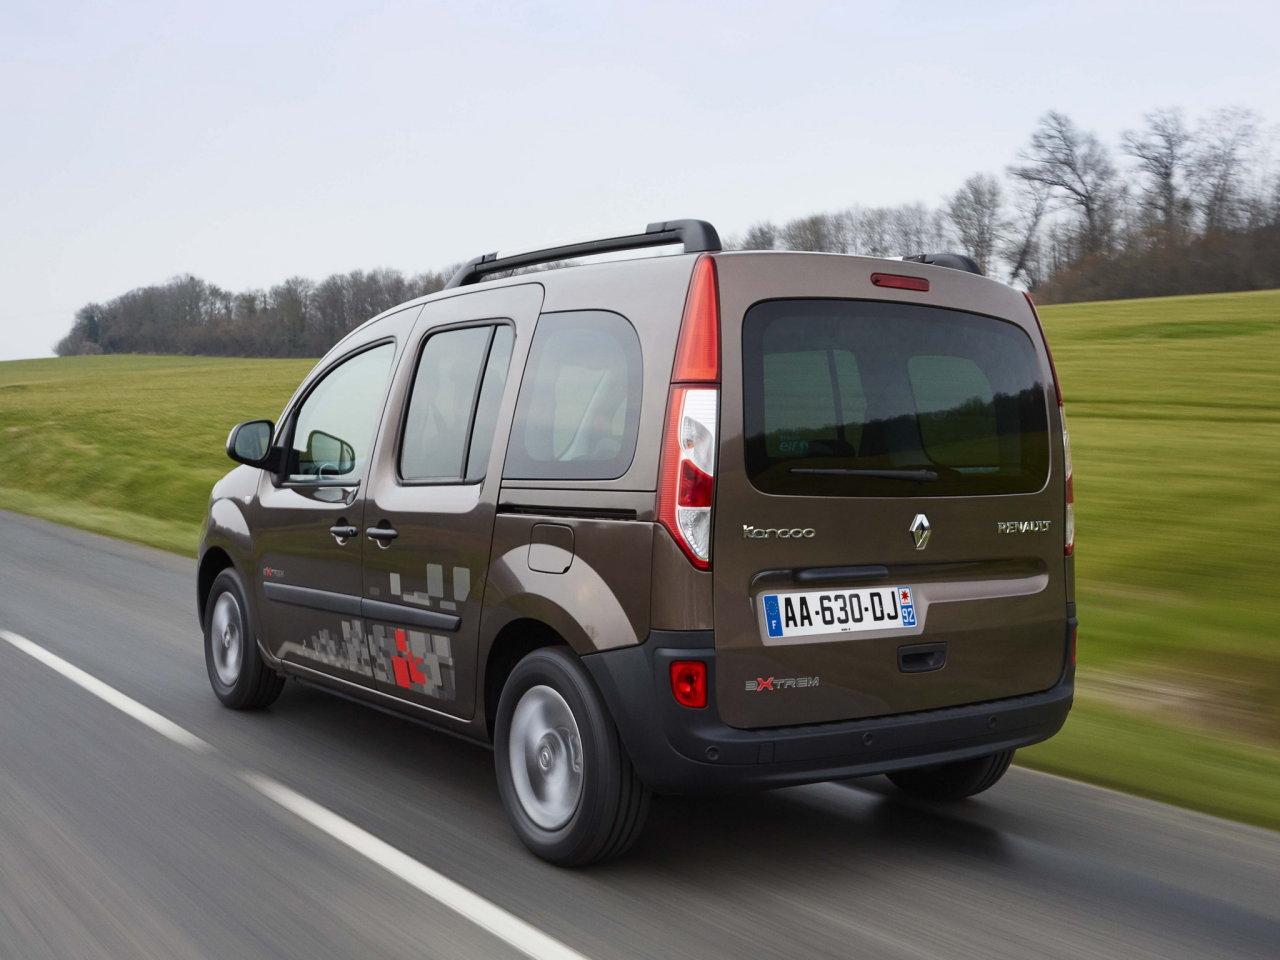 2014 Renault Kangoo Image Gallery.